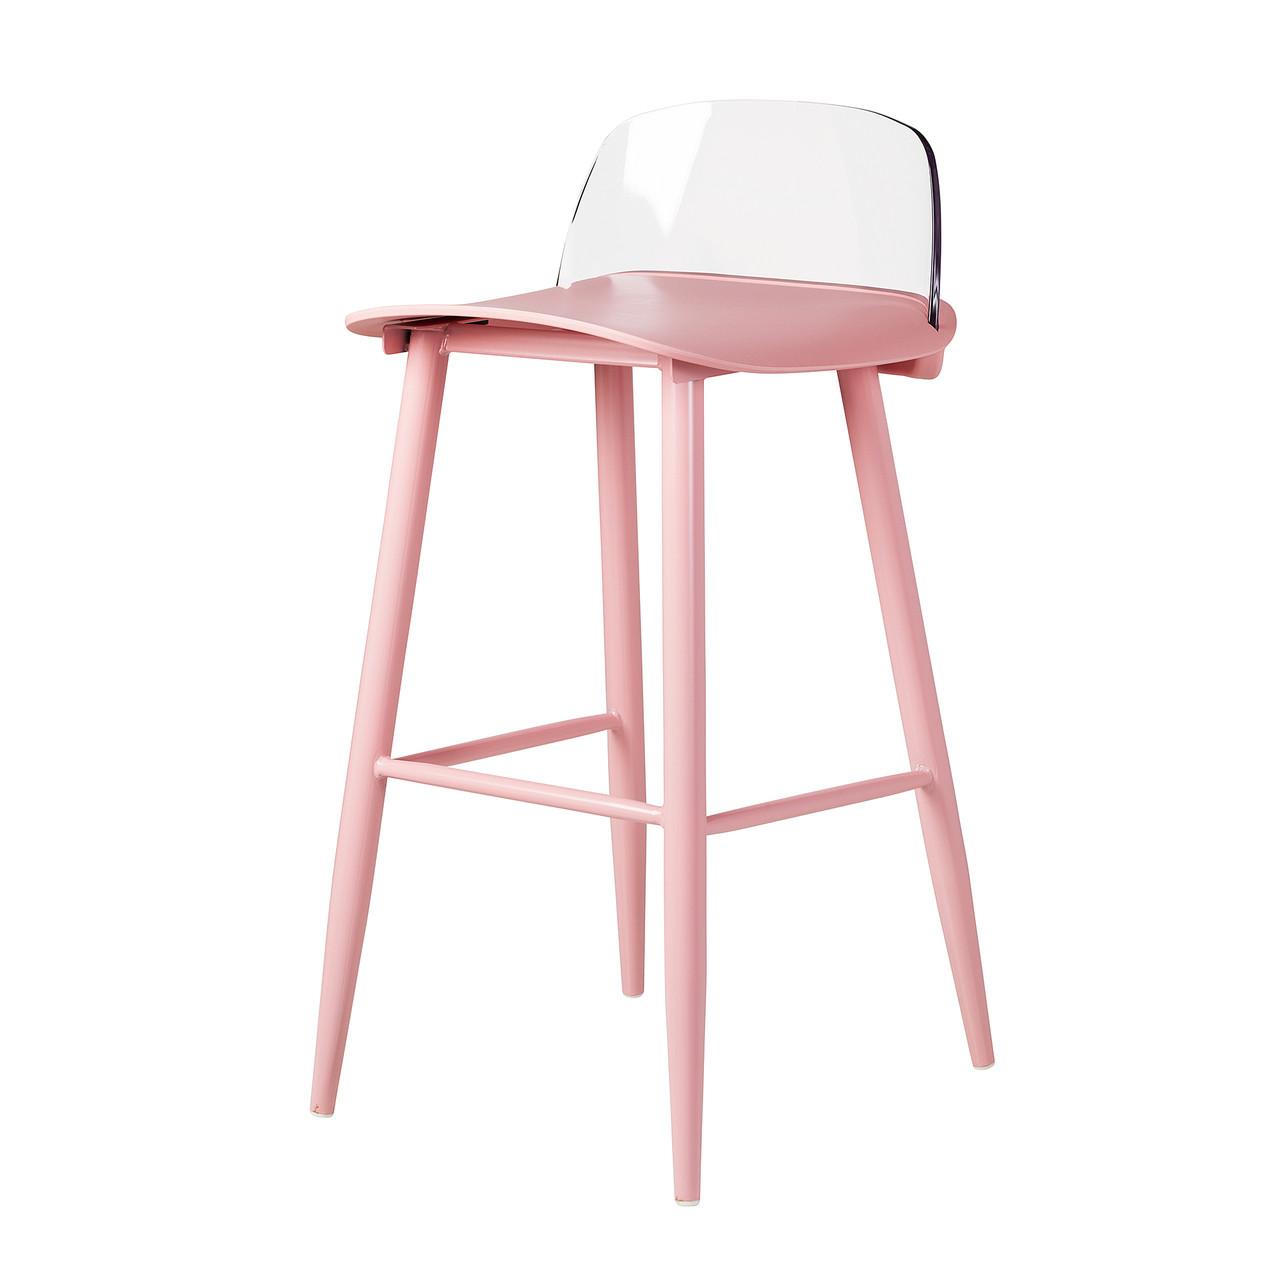 buy online b6af4 06c8b Nerd Replica Bar Stool in Pink